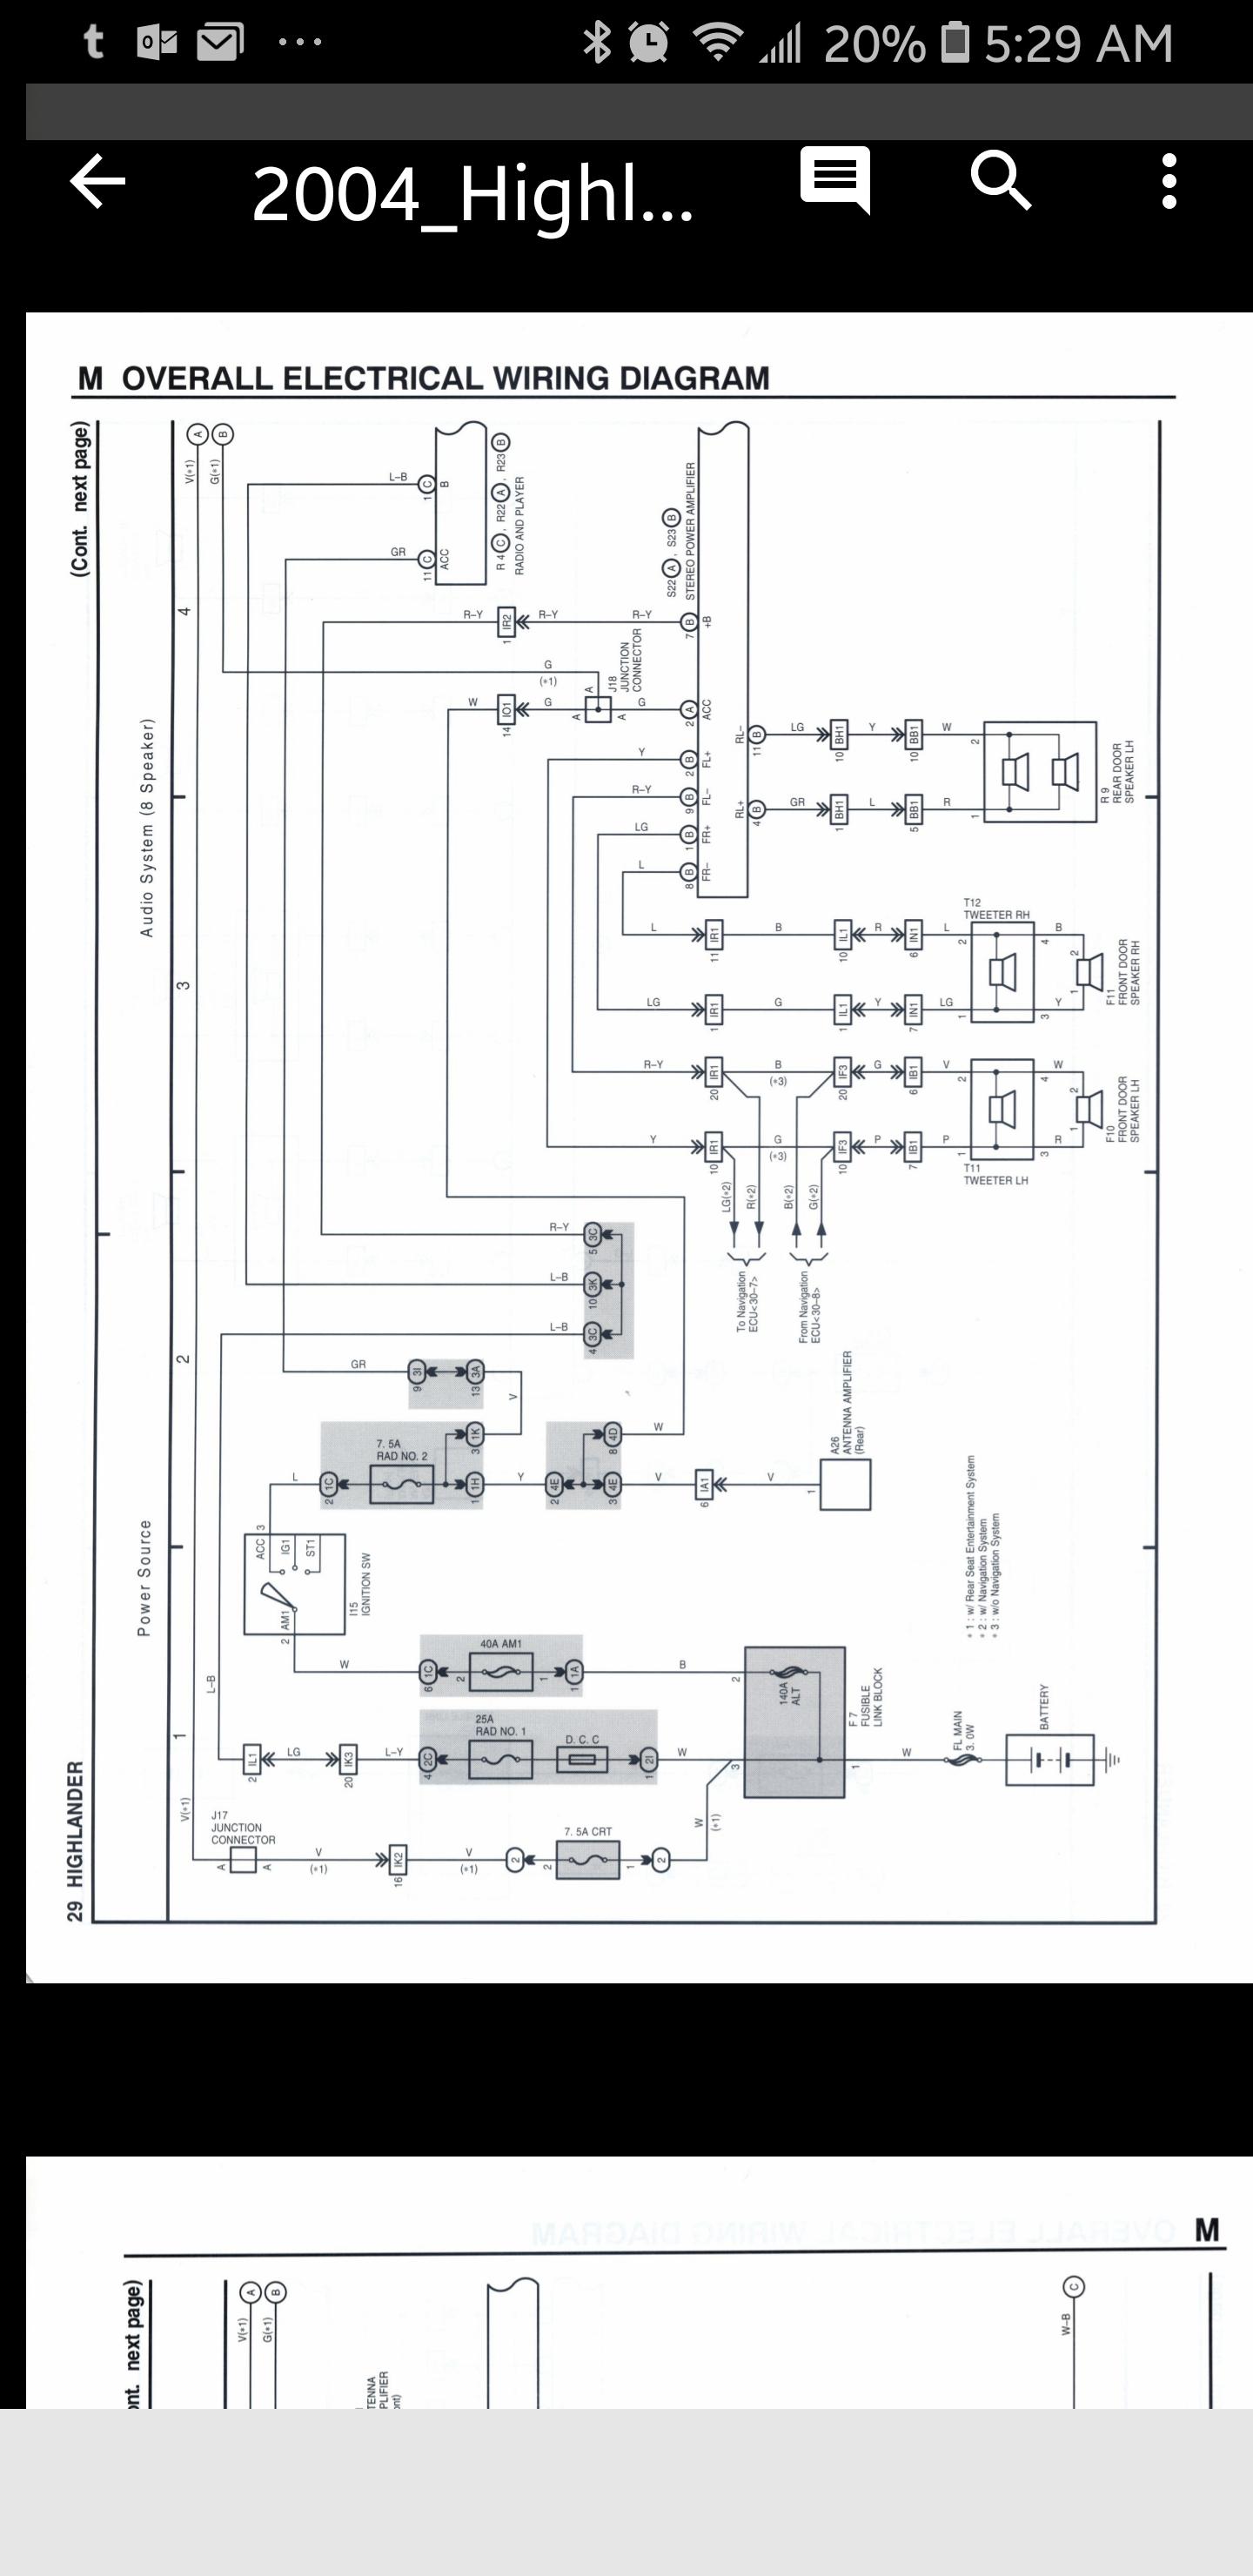 2007 Highlander Wiring Diagrams Diagram Libraries Jbl Kit For Aftermarket Stereo Headunitclick Image Larger Version Name Screenshot 20181019 052946 1540287404014